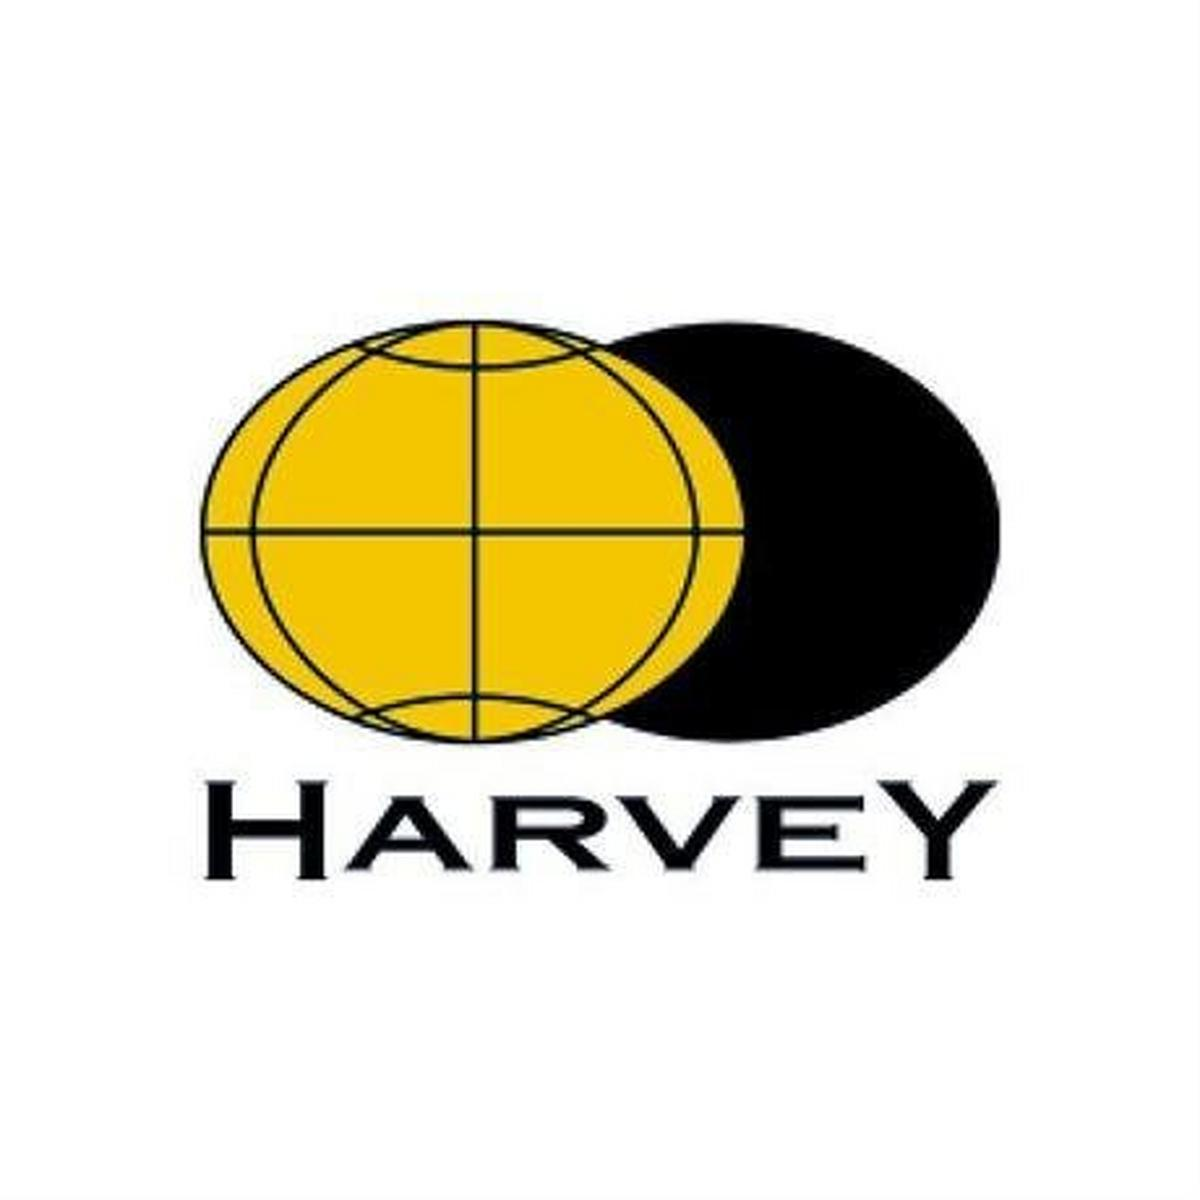 Harveys Harvey Map - Superwalker XT25: Lake District - South East